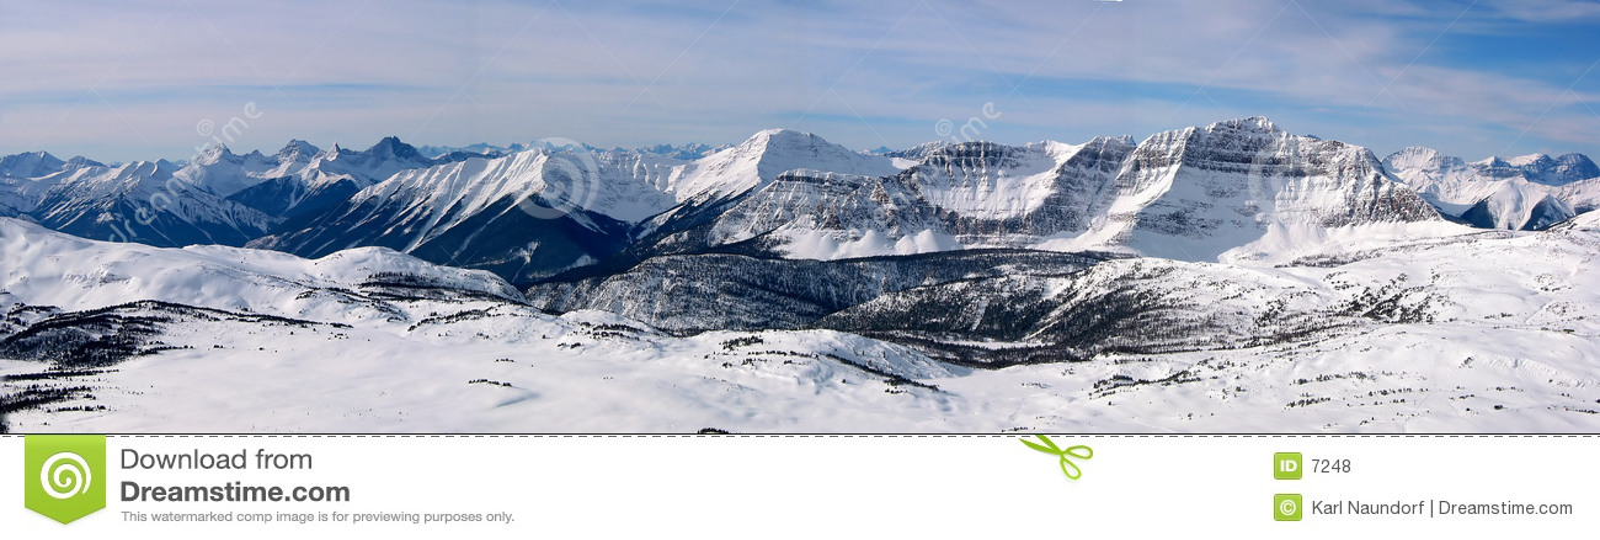 Montaña 2 panorámicos